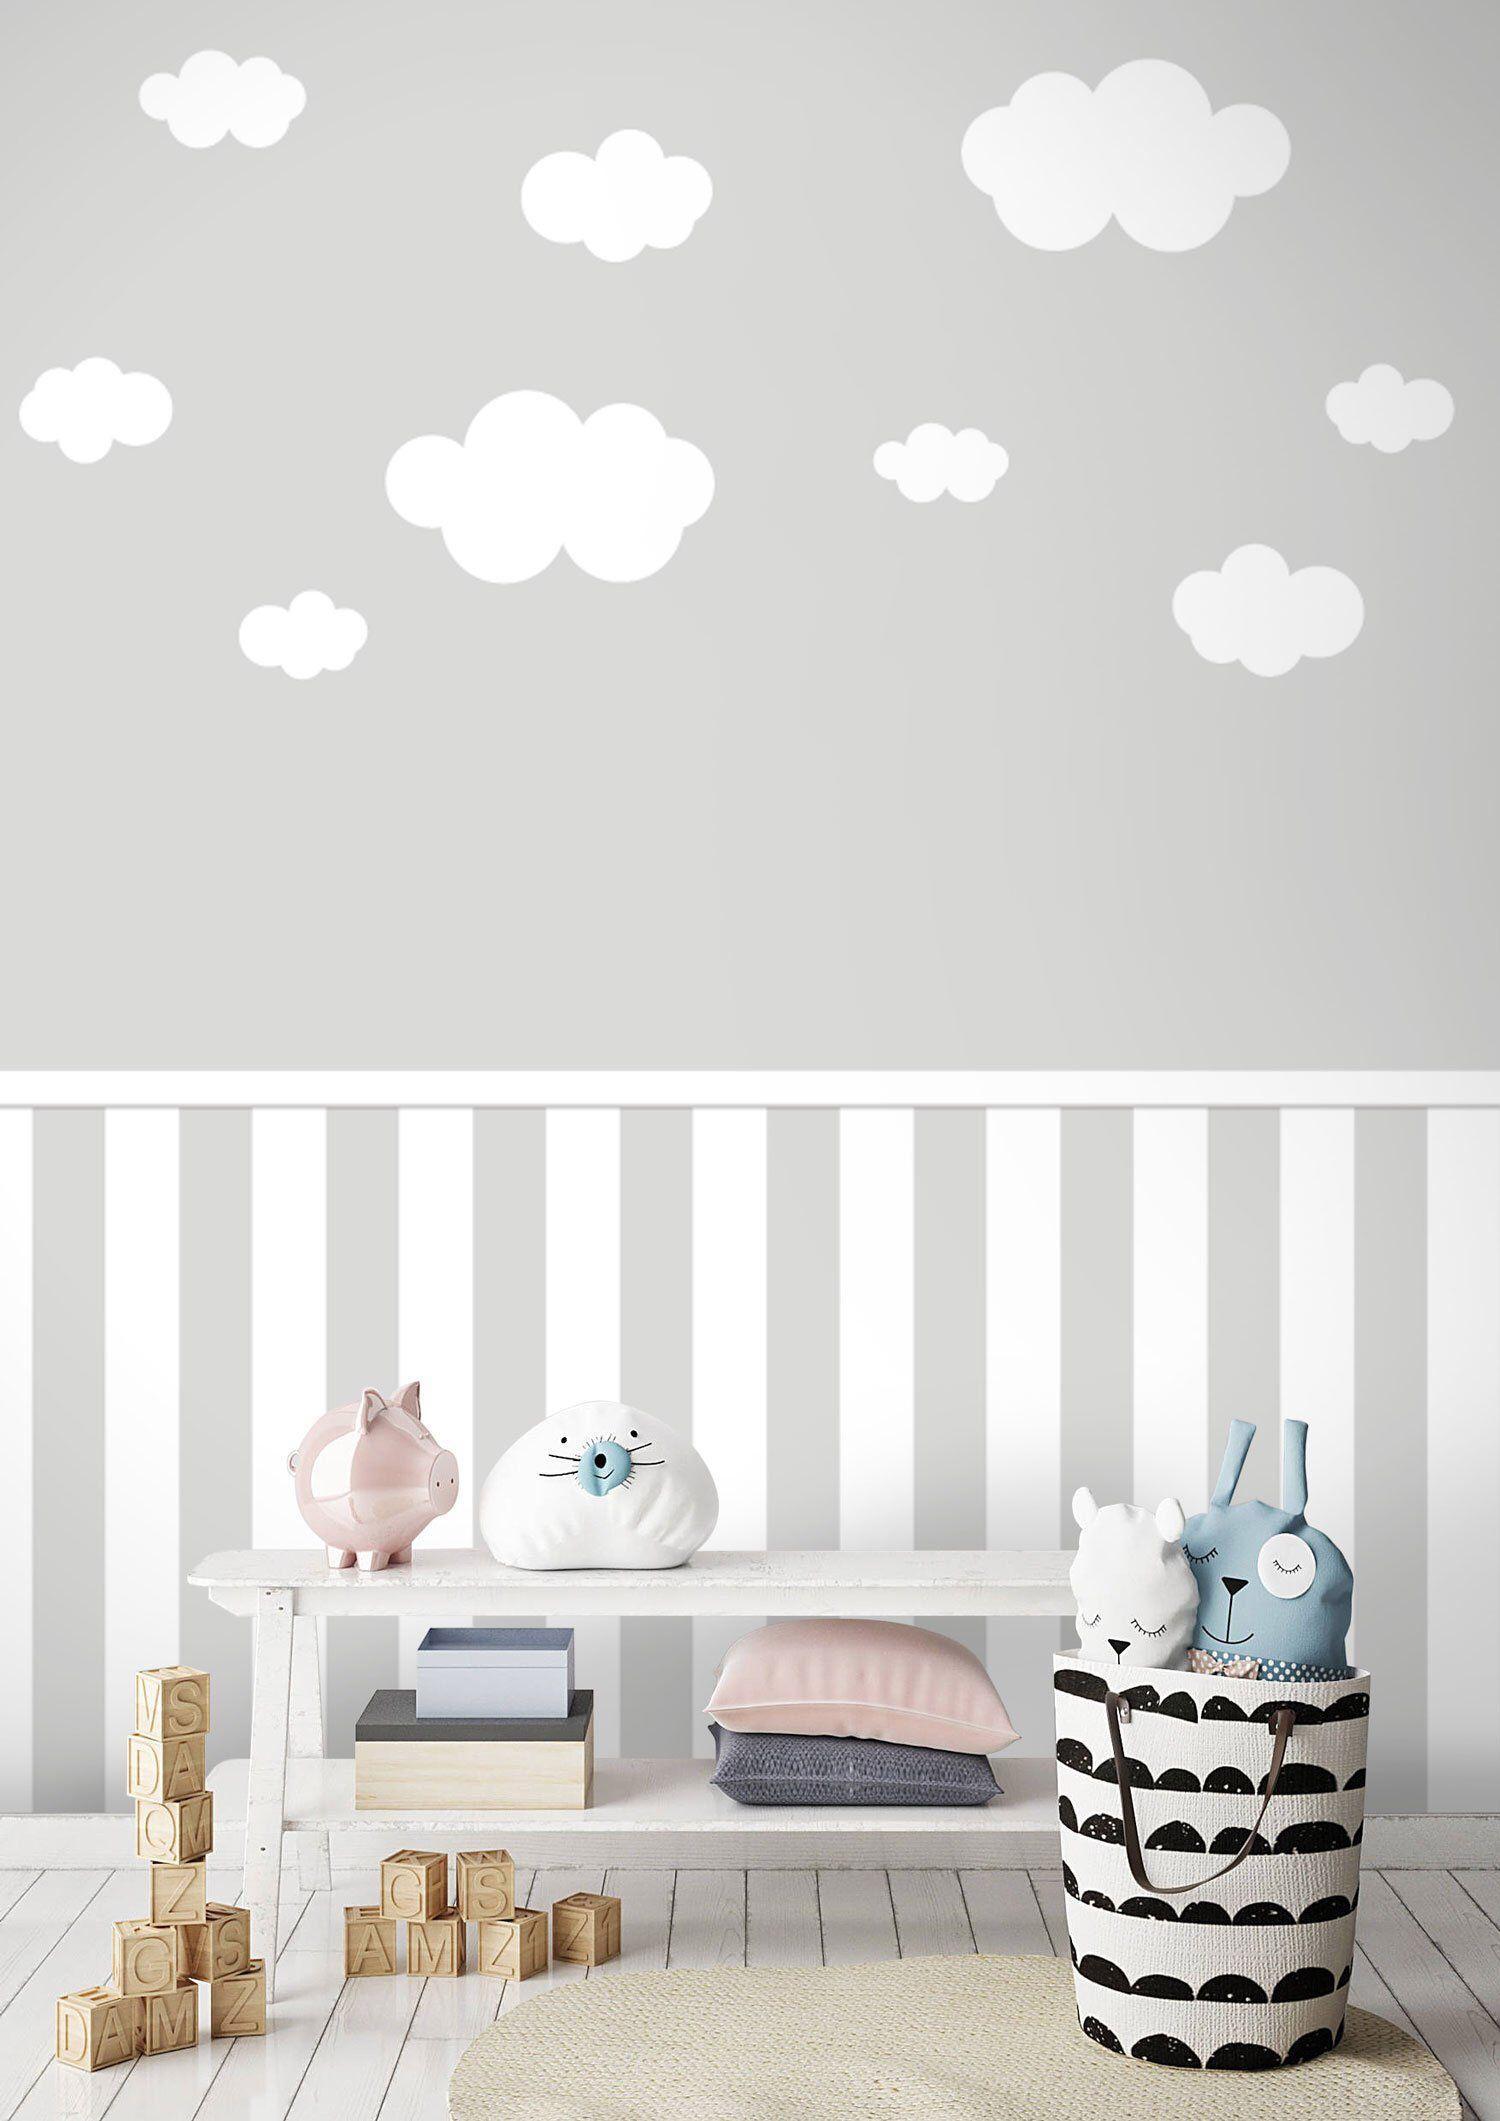 Tapete, Fototapete, Kinderzimmer, Baby, Wolken, Sockel, Wunschfarbe ...